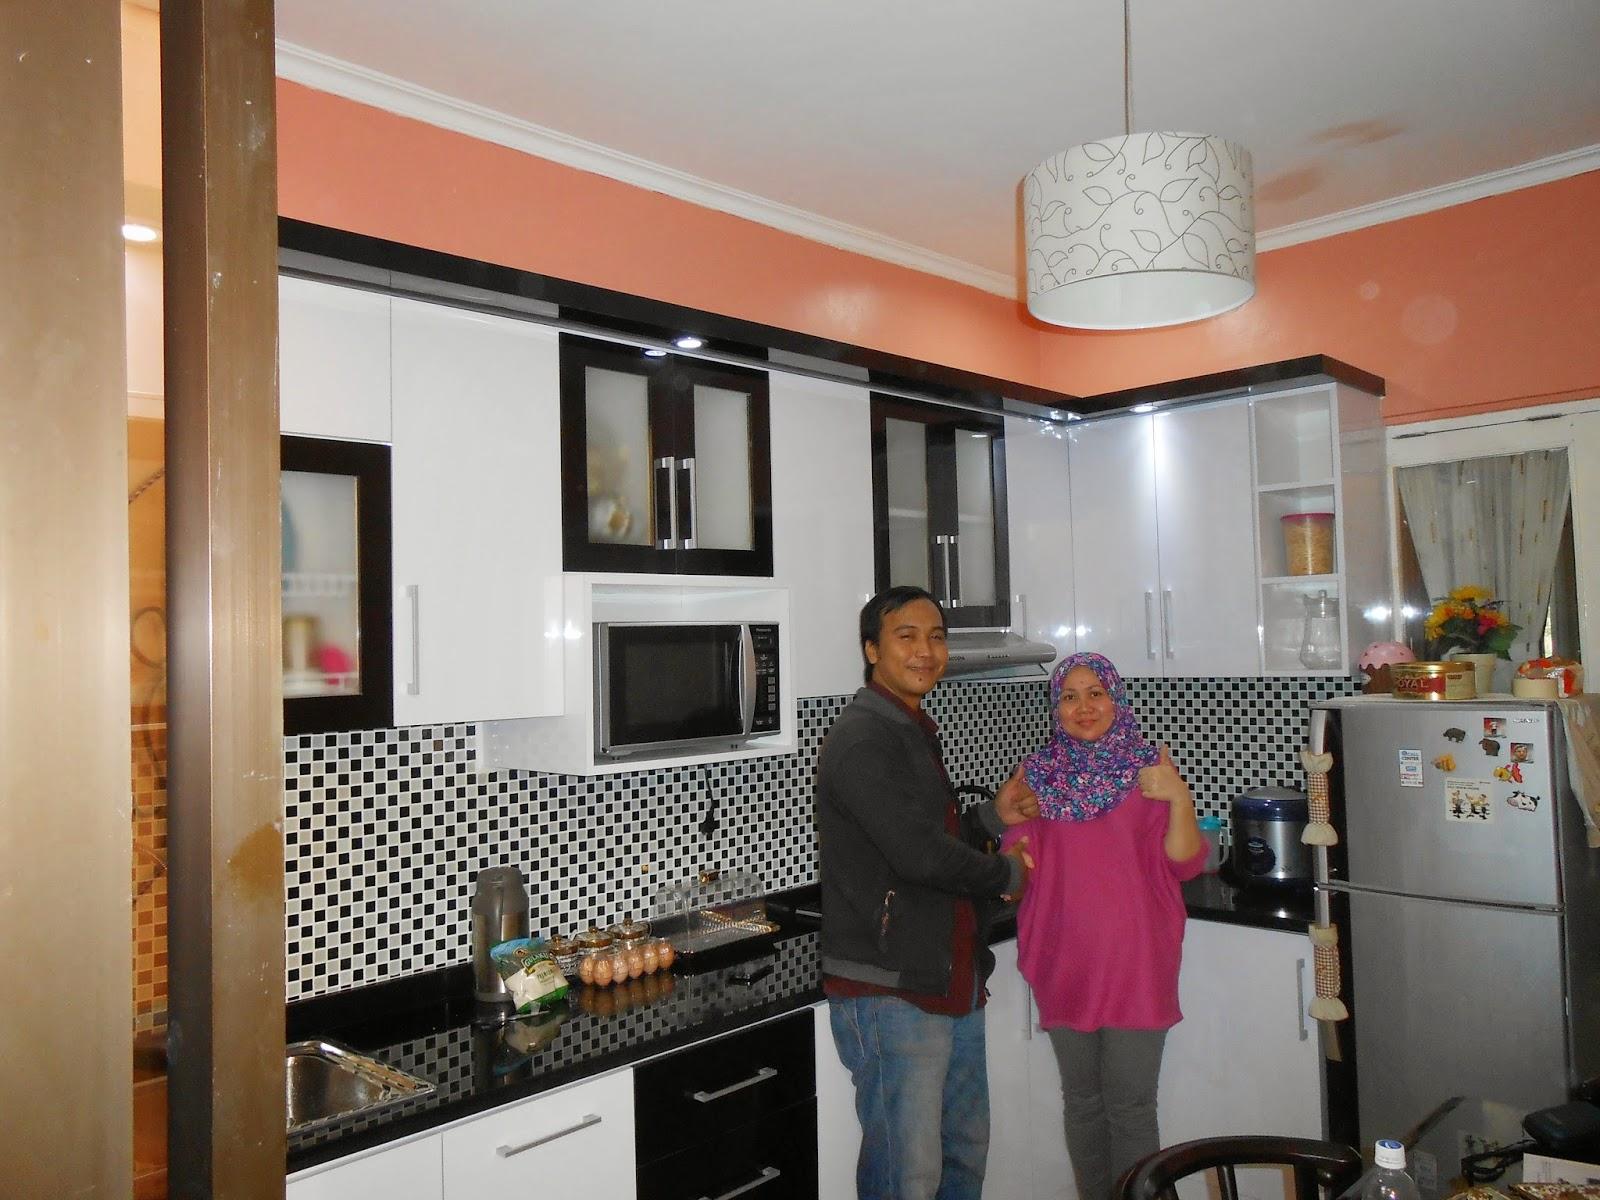 berlian kitchen set minimalis murah kitchen set cikarang bekasi tambun cibitung jakarta. Black Bedroom Furniture Sets. Home Design Ideas